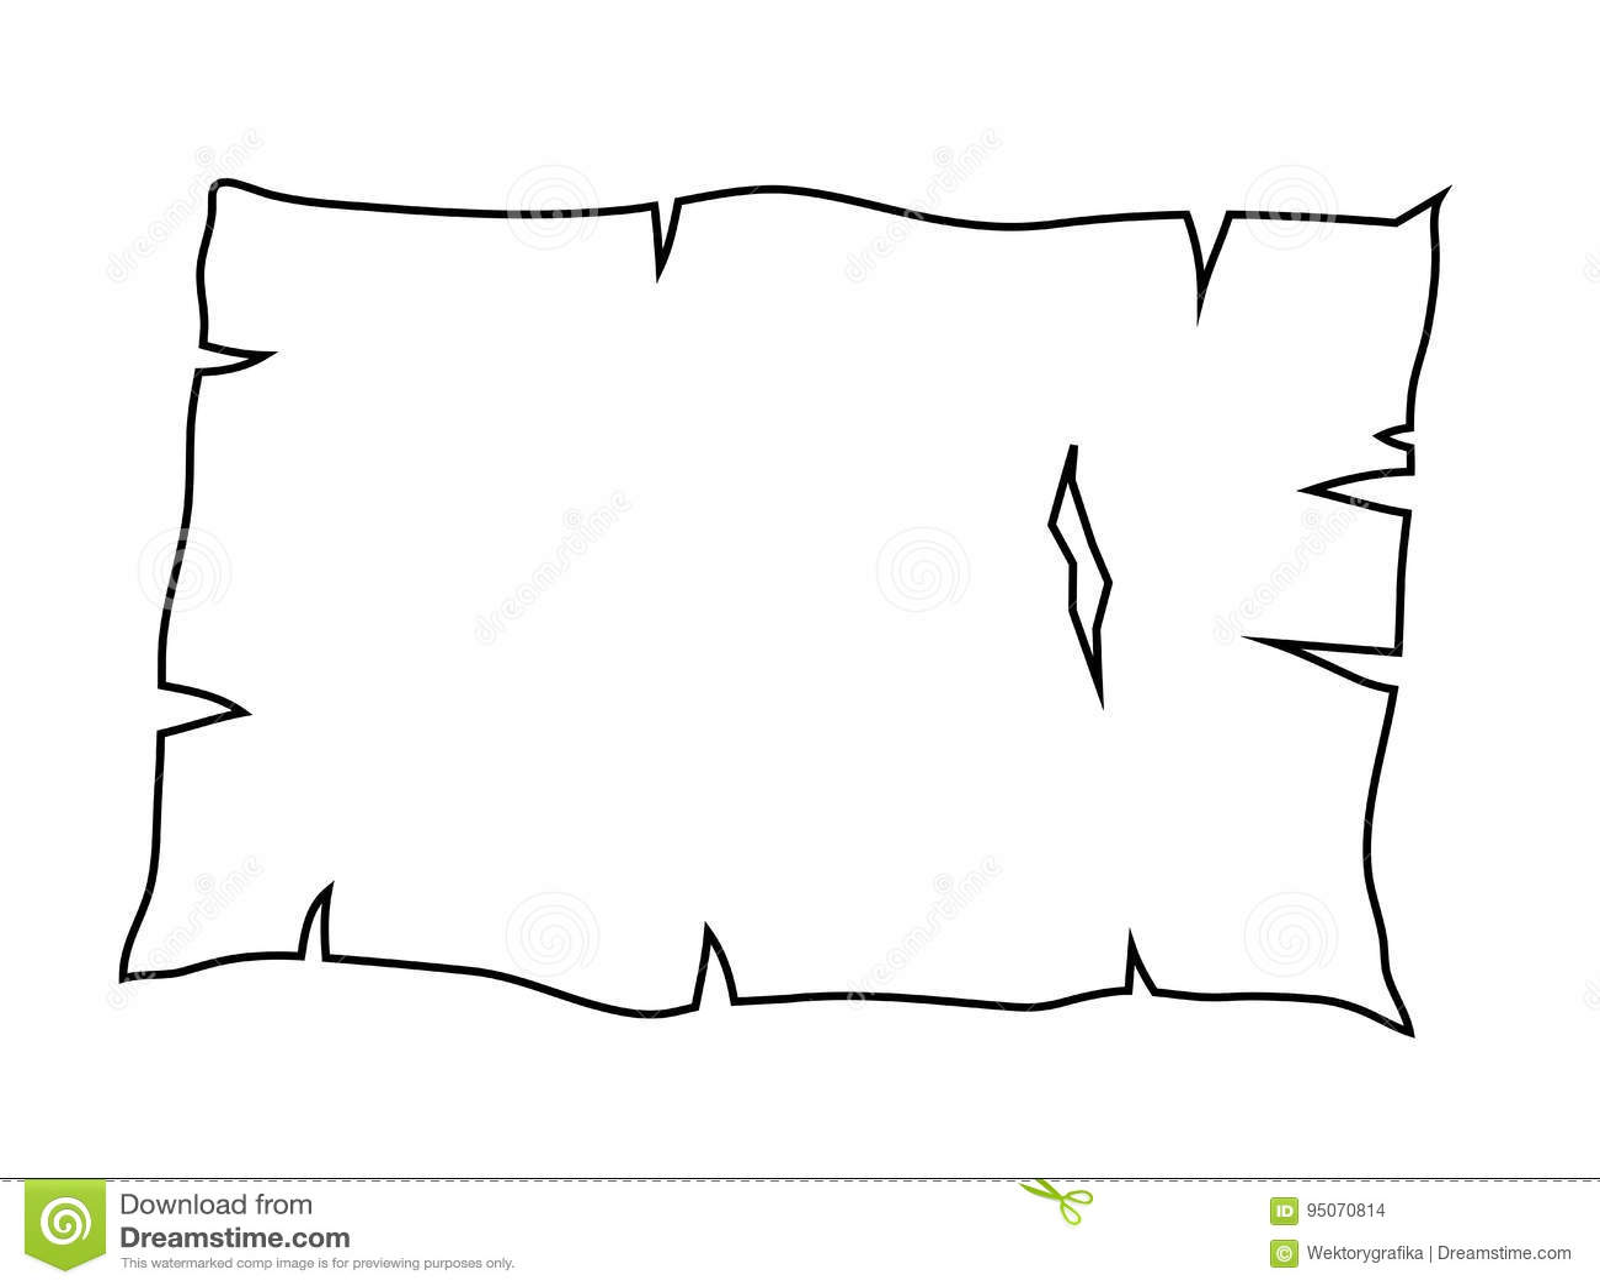 vector burned paper edges seamless horizontal pattern banners or dividers cartoon vector. Black Bedroom Furniture Sets. Home Design Ideas